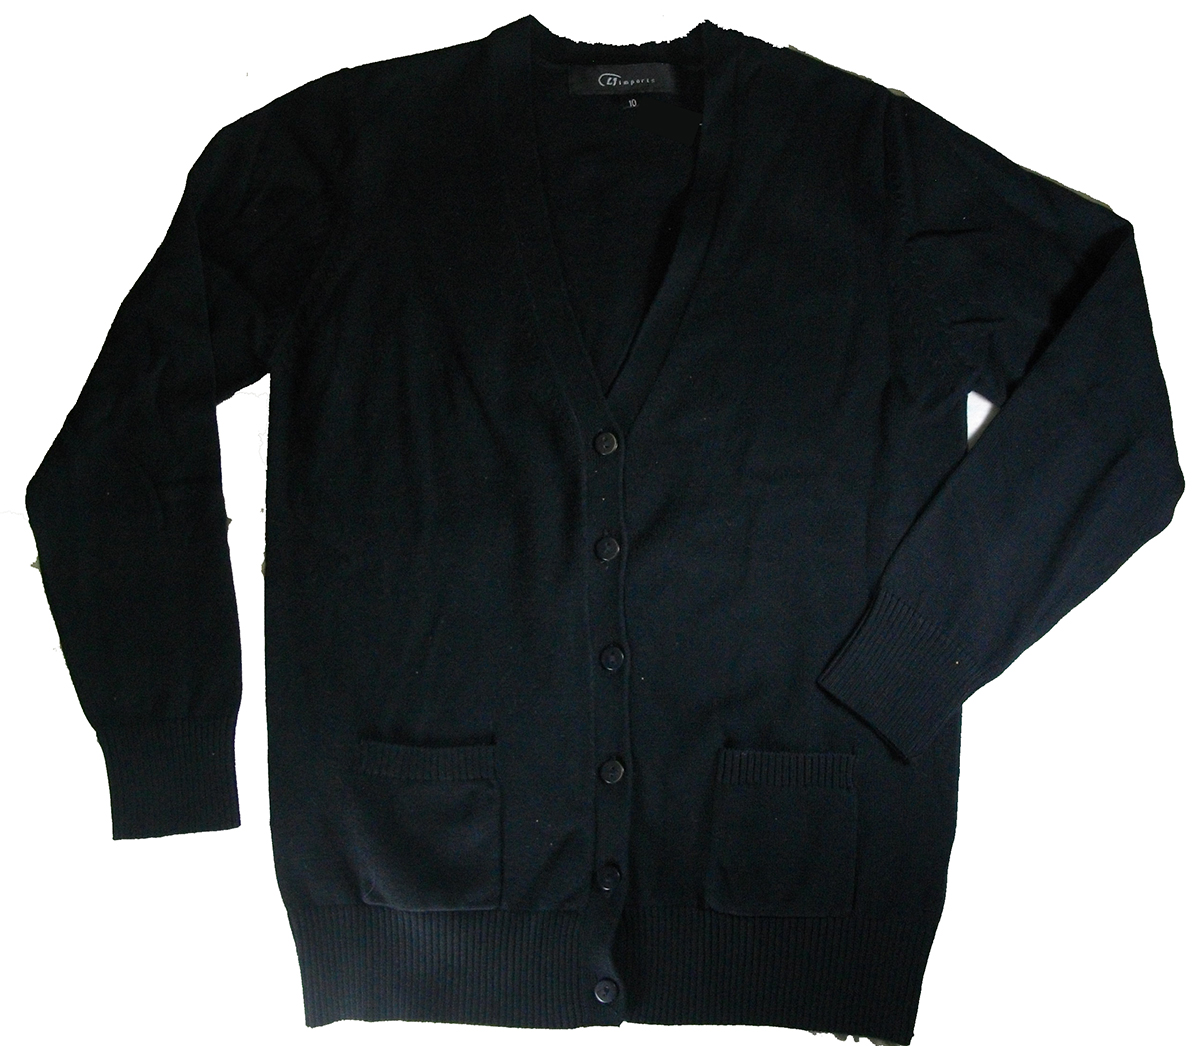 Girls Sweater V-neck Cardigan Black 100% Cotton - Engelic Uniforms